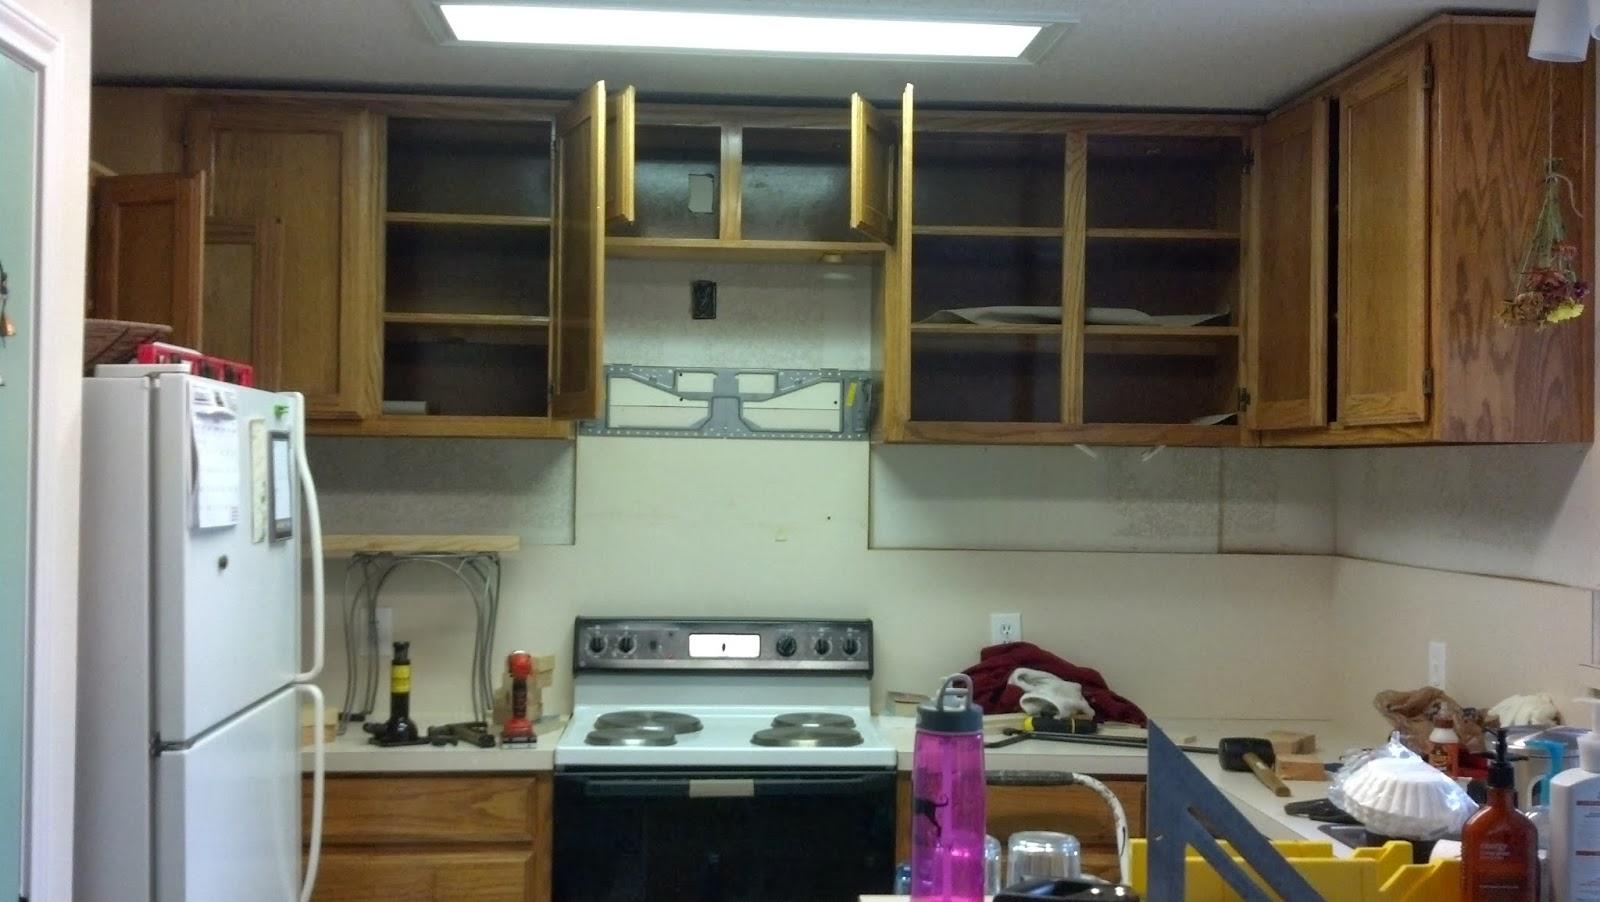 How to Fix Kitchen CabiShelf